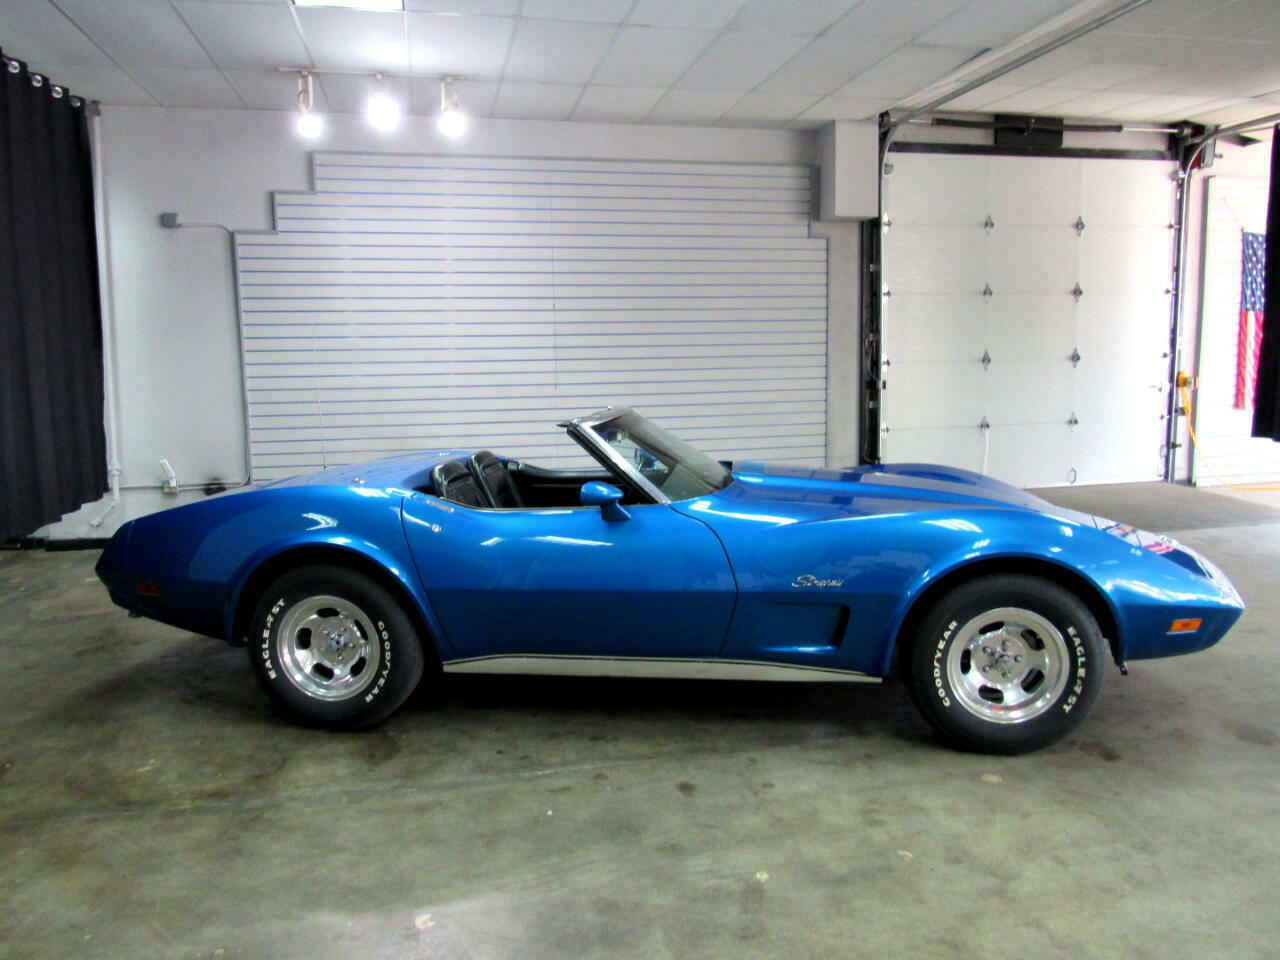 1974 Blue Chevrolet Corvette Convertible  | C3 Corvette Photo 4